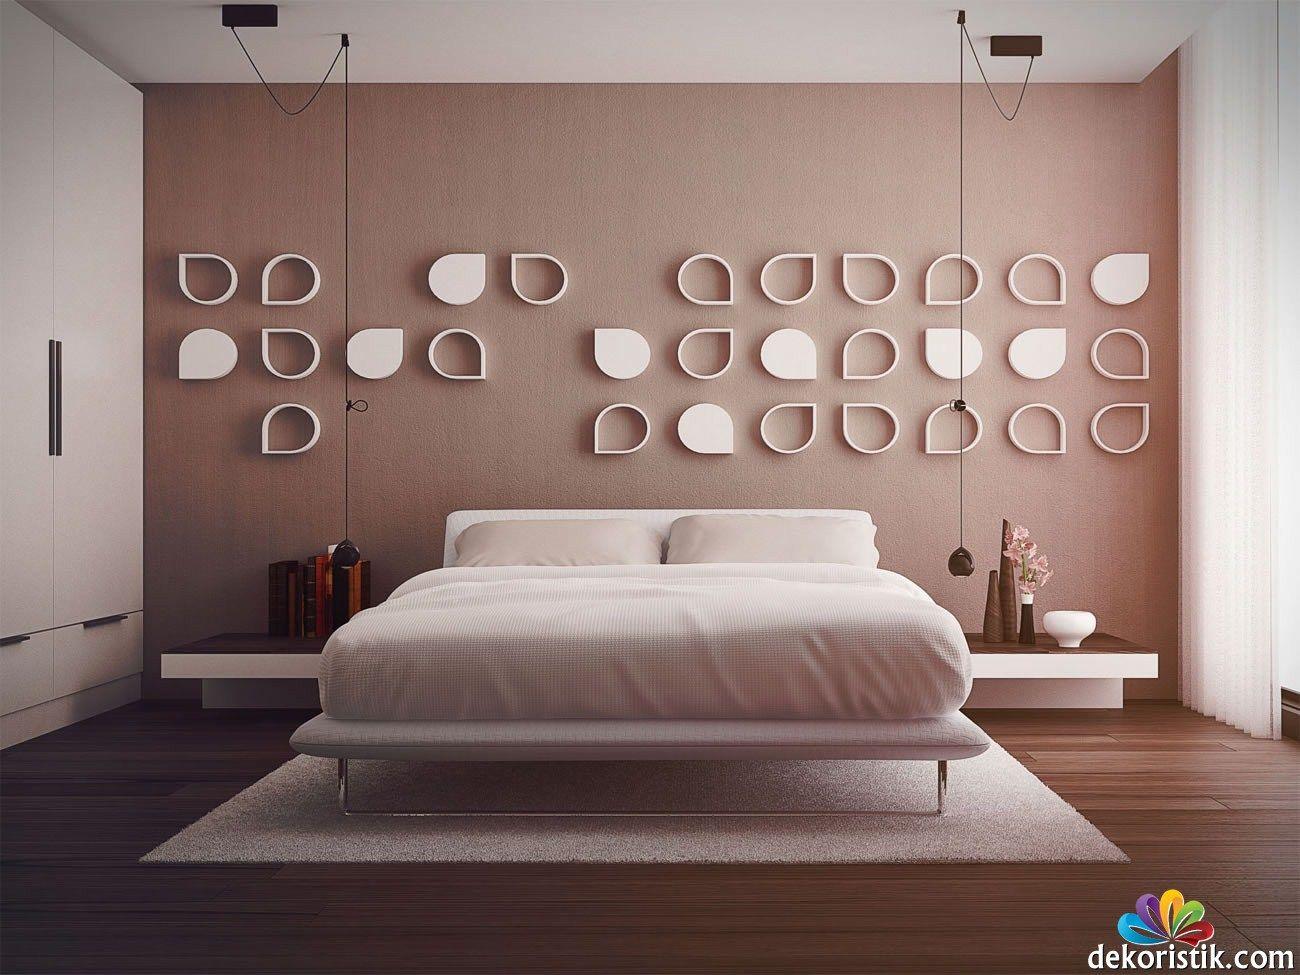 Schlafzimmer Altrosa ~ Kreative schlafzimmer design ideen check more at